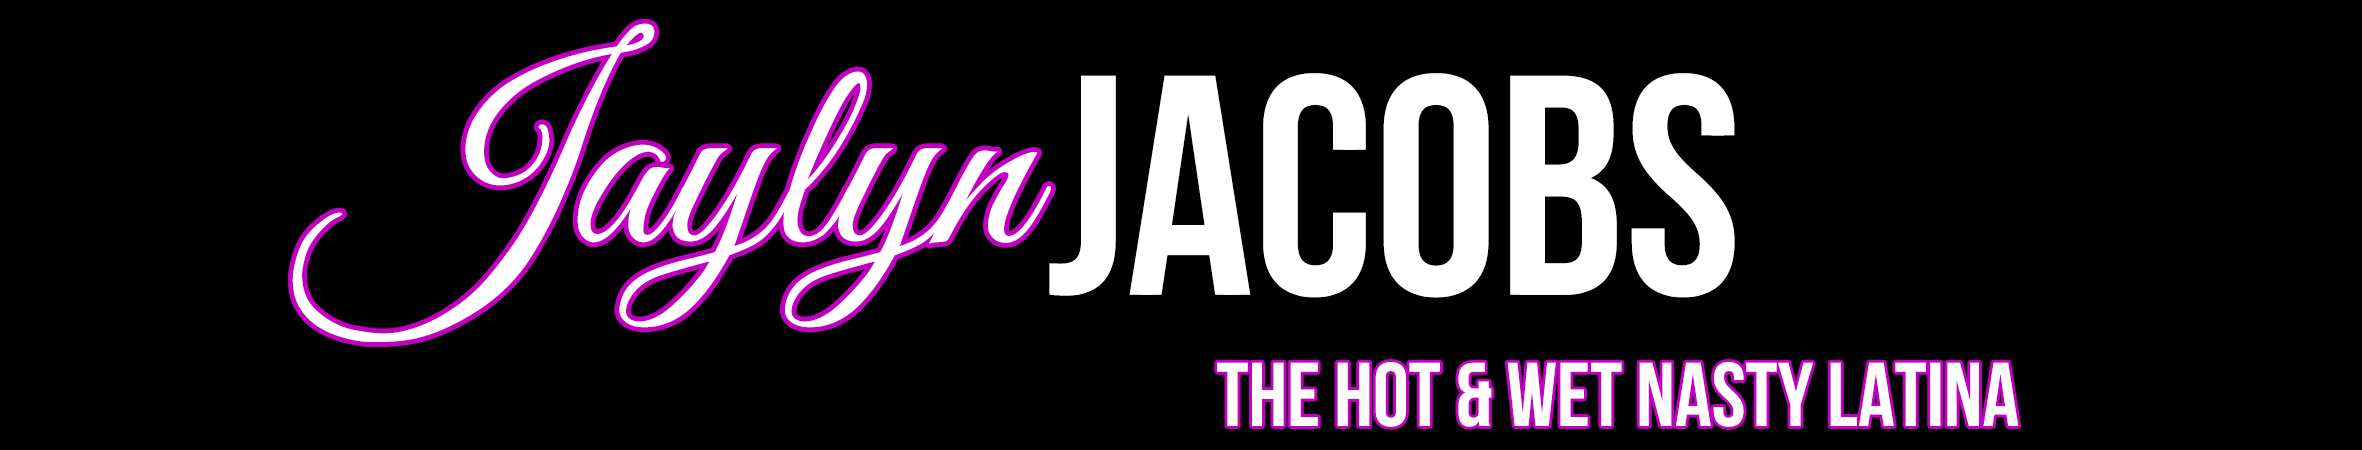 Logo-With-Subtitle-001-BlackBackground-2362X450